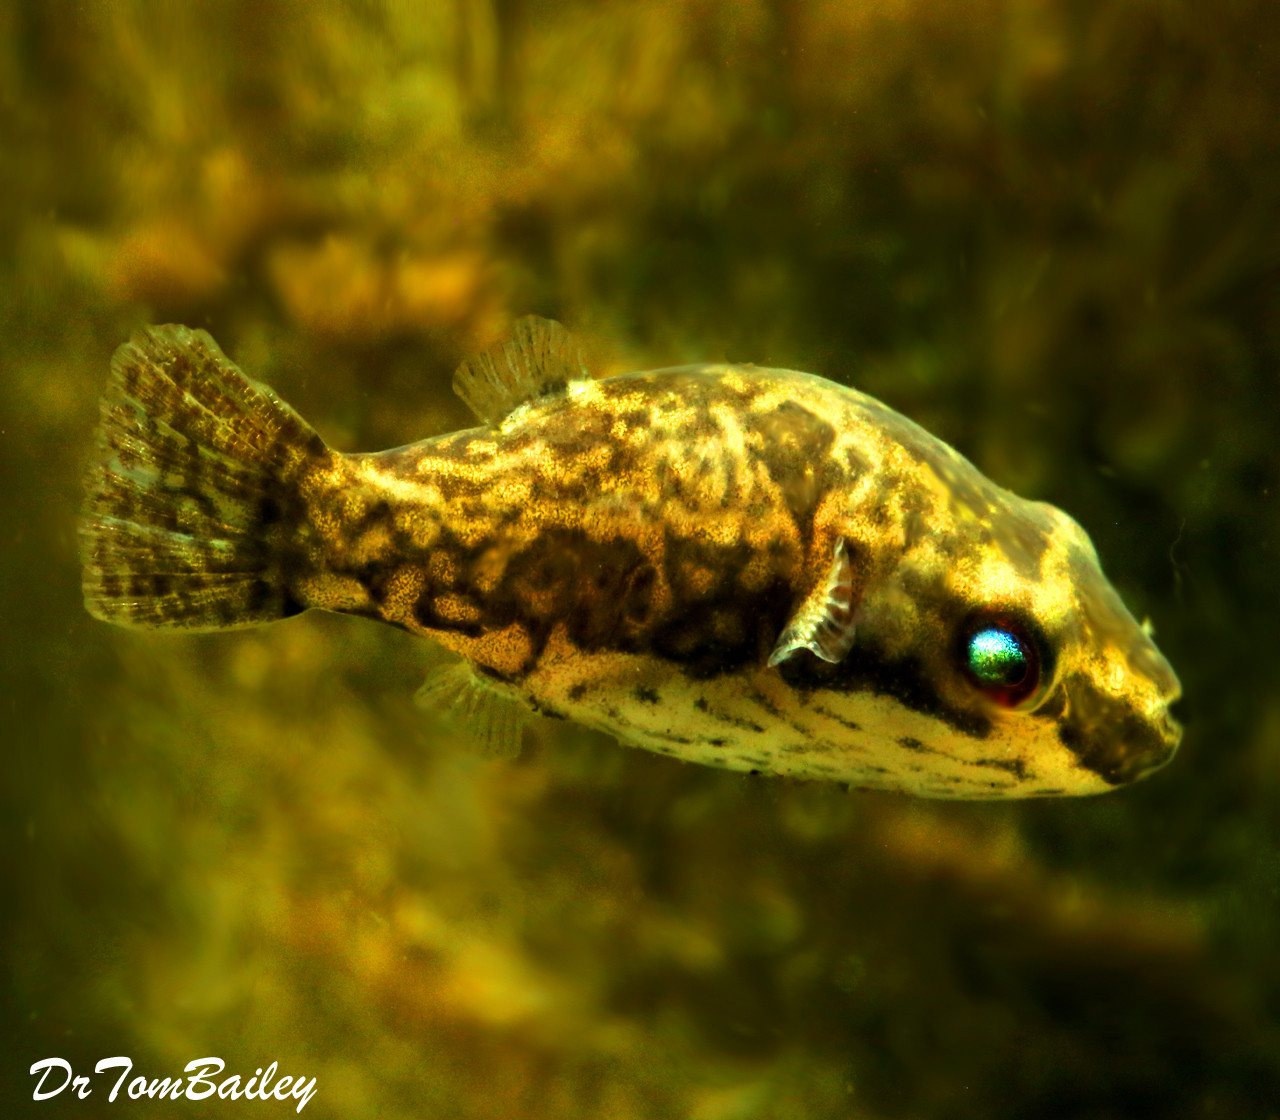 "Premium FEMALE Freshwater Redtail Red Eye Dwarf Pufferfish, 1"" to 1.2"" long"